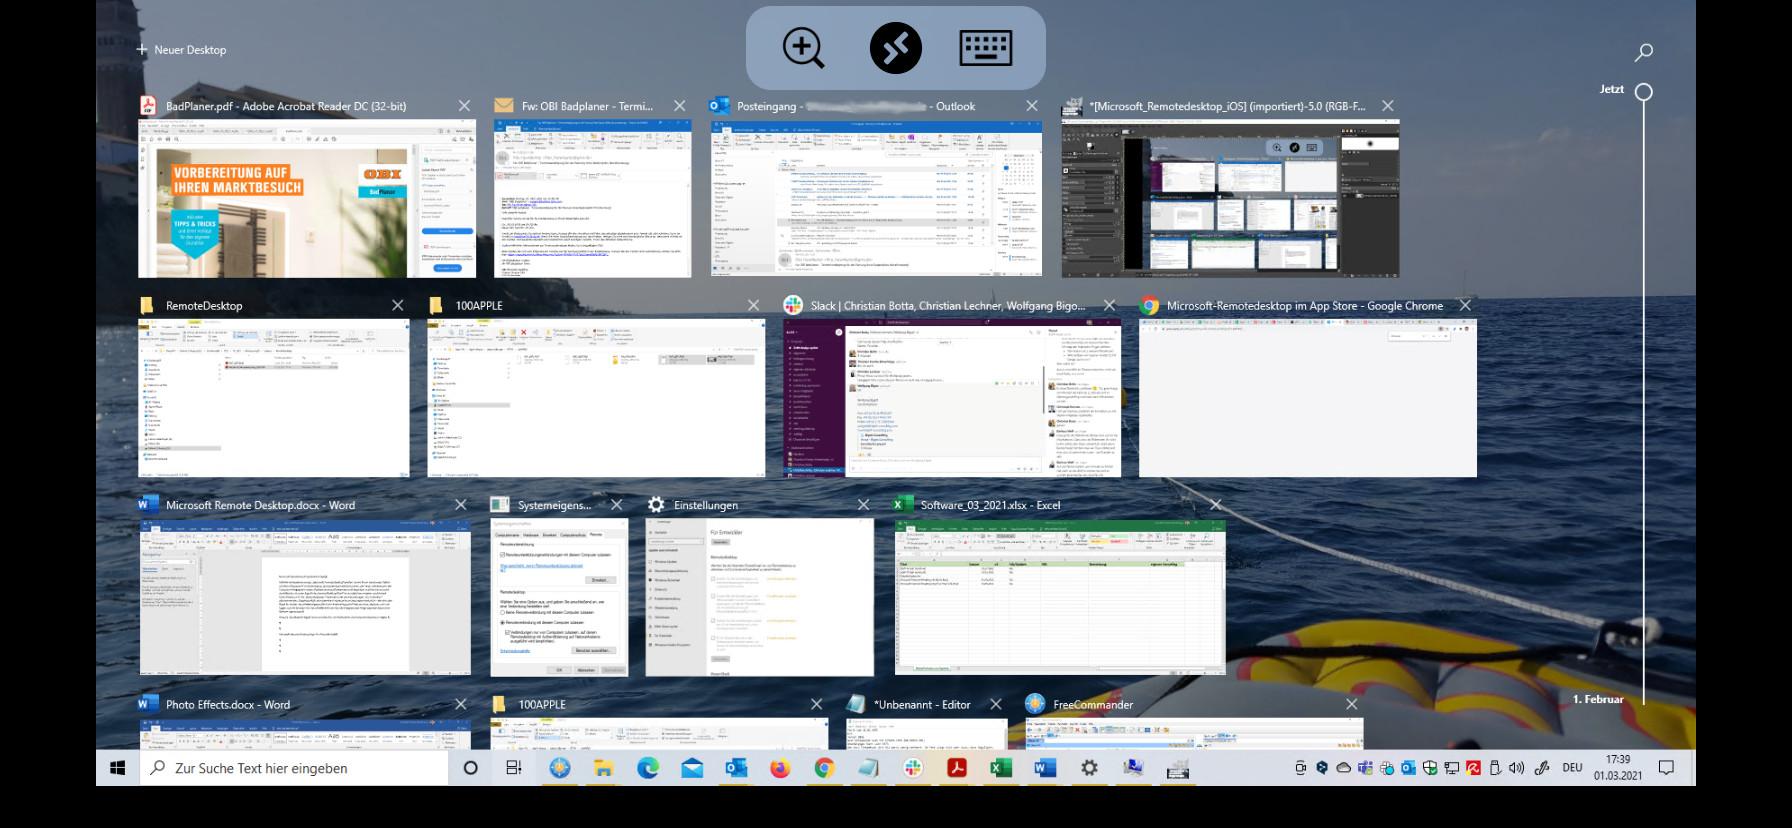 Screenshot 1 - Microsoft Remote Desktop (App für iPhone & iPad)